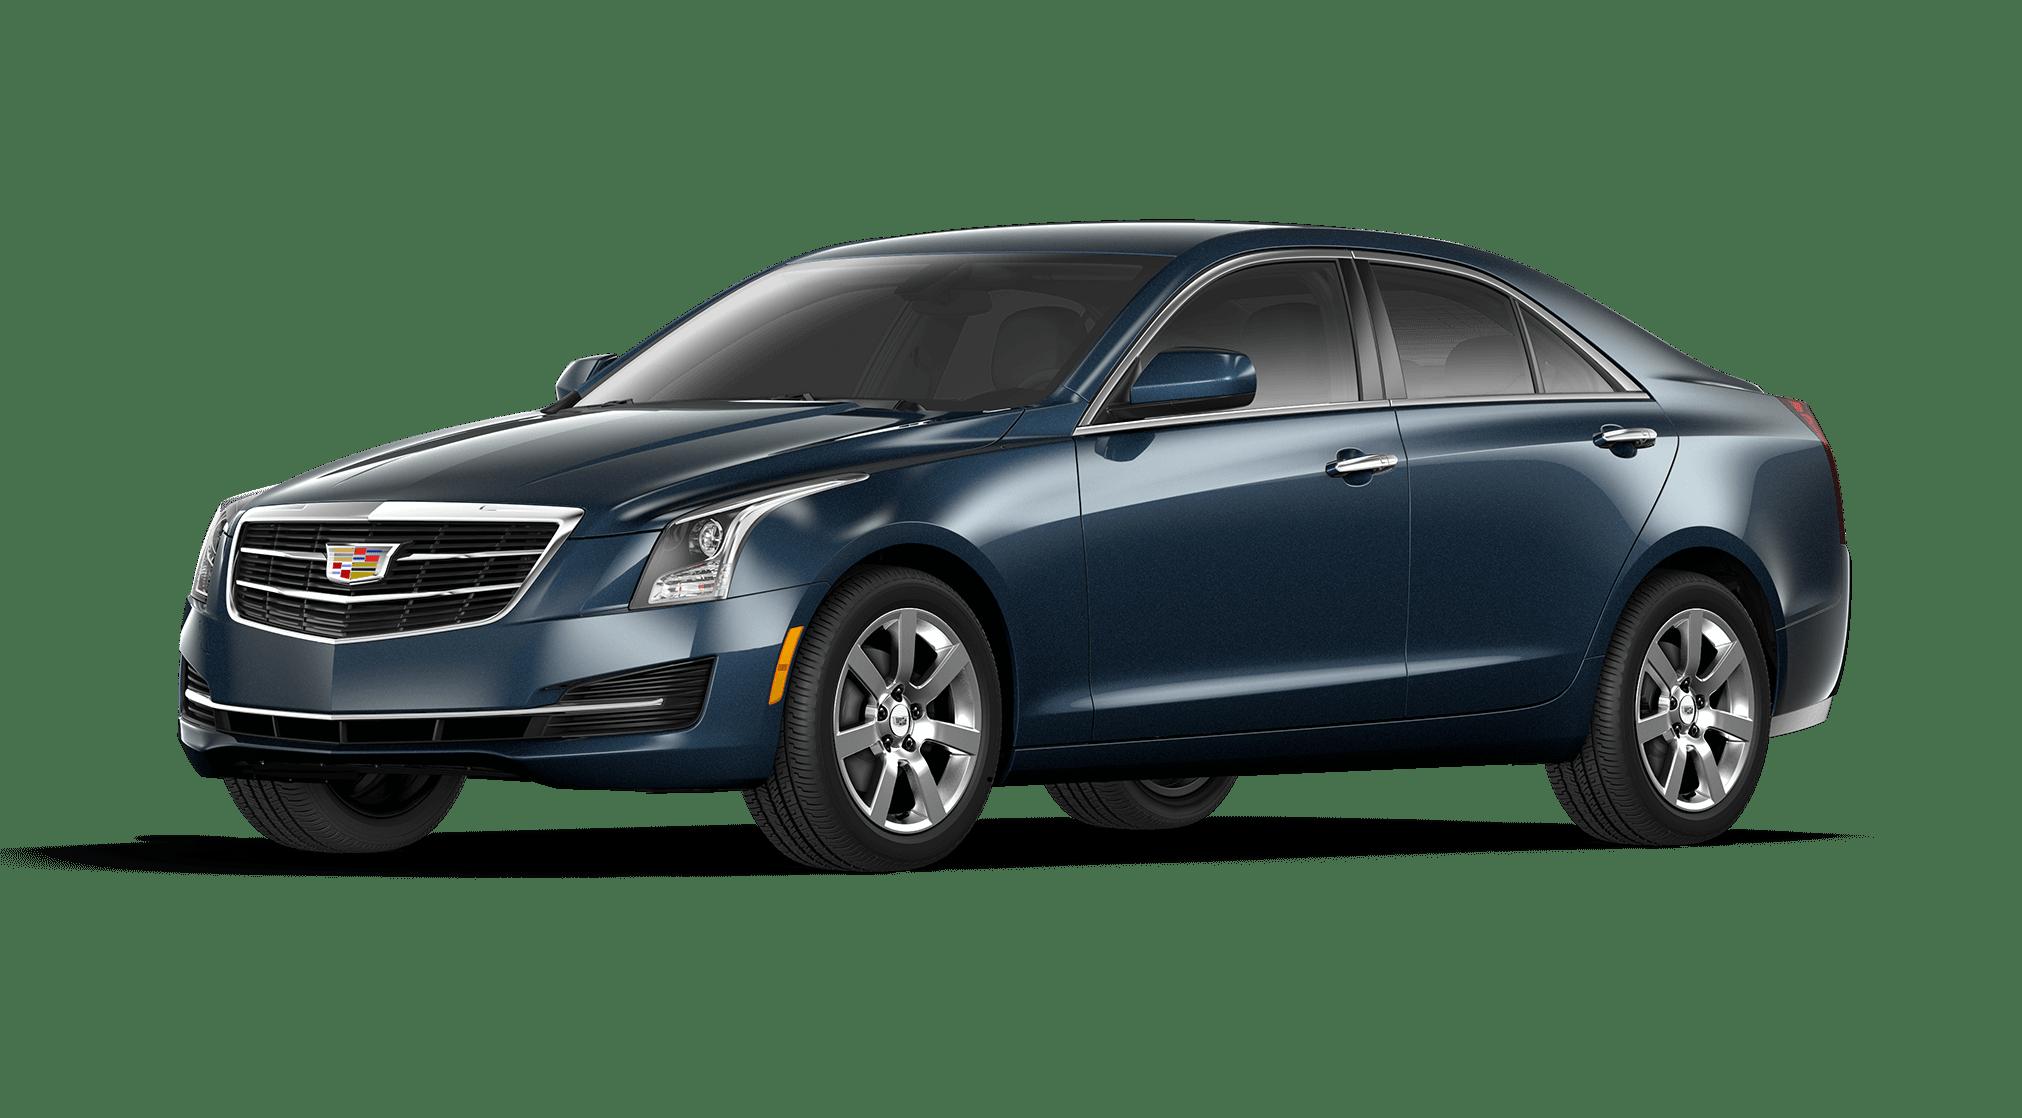 Dark Adriatic Blue Cadillac ATS